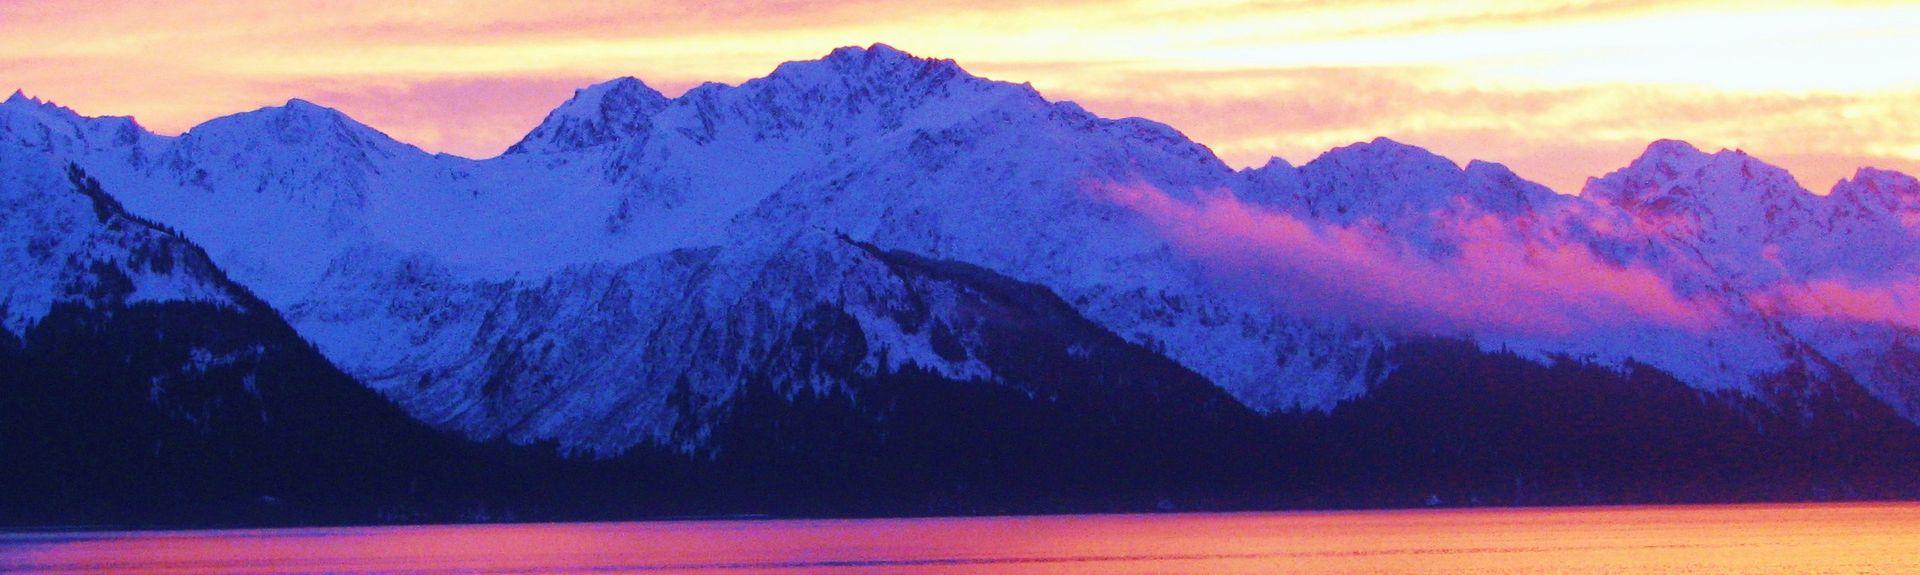 Lowell Point, Seward, Alaska, United States of America